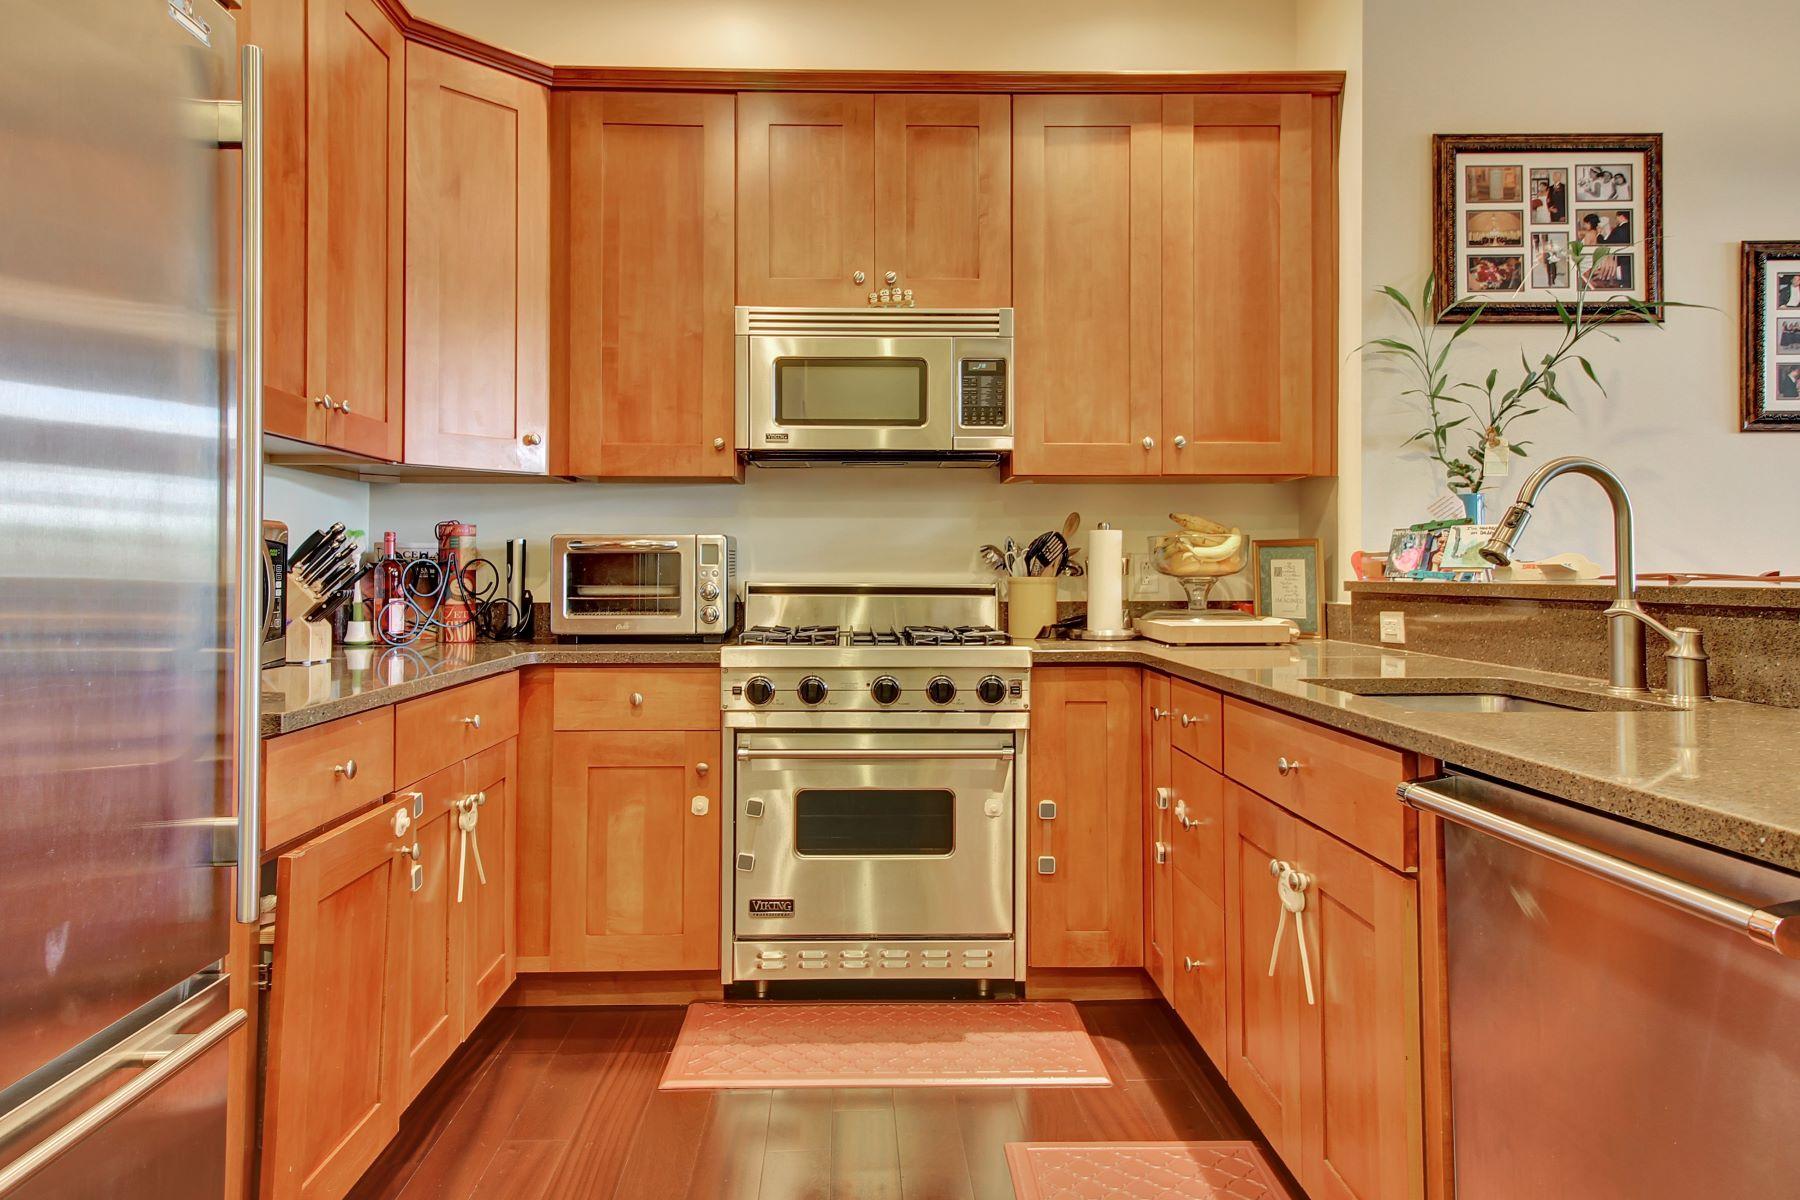 شقة بعمارة للـ Sale في Discover Pure Luxury 7400 River Road #108 North Bergen, New Jersey, 07047 United States